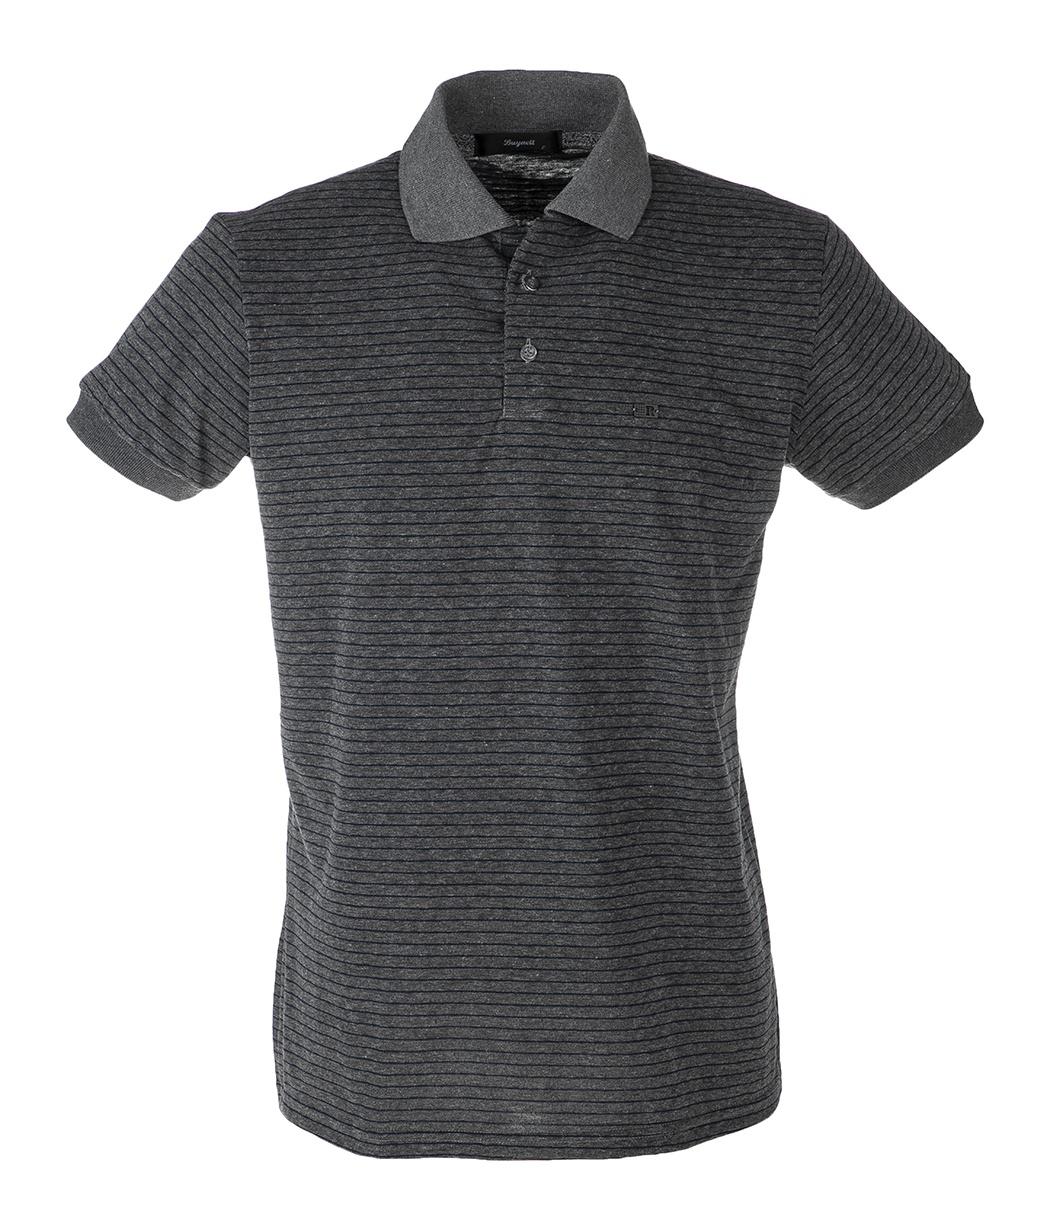 پولو شرت مردانه بای نت کد 275-3